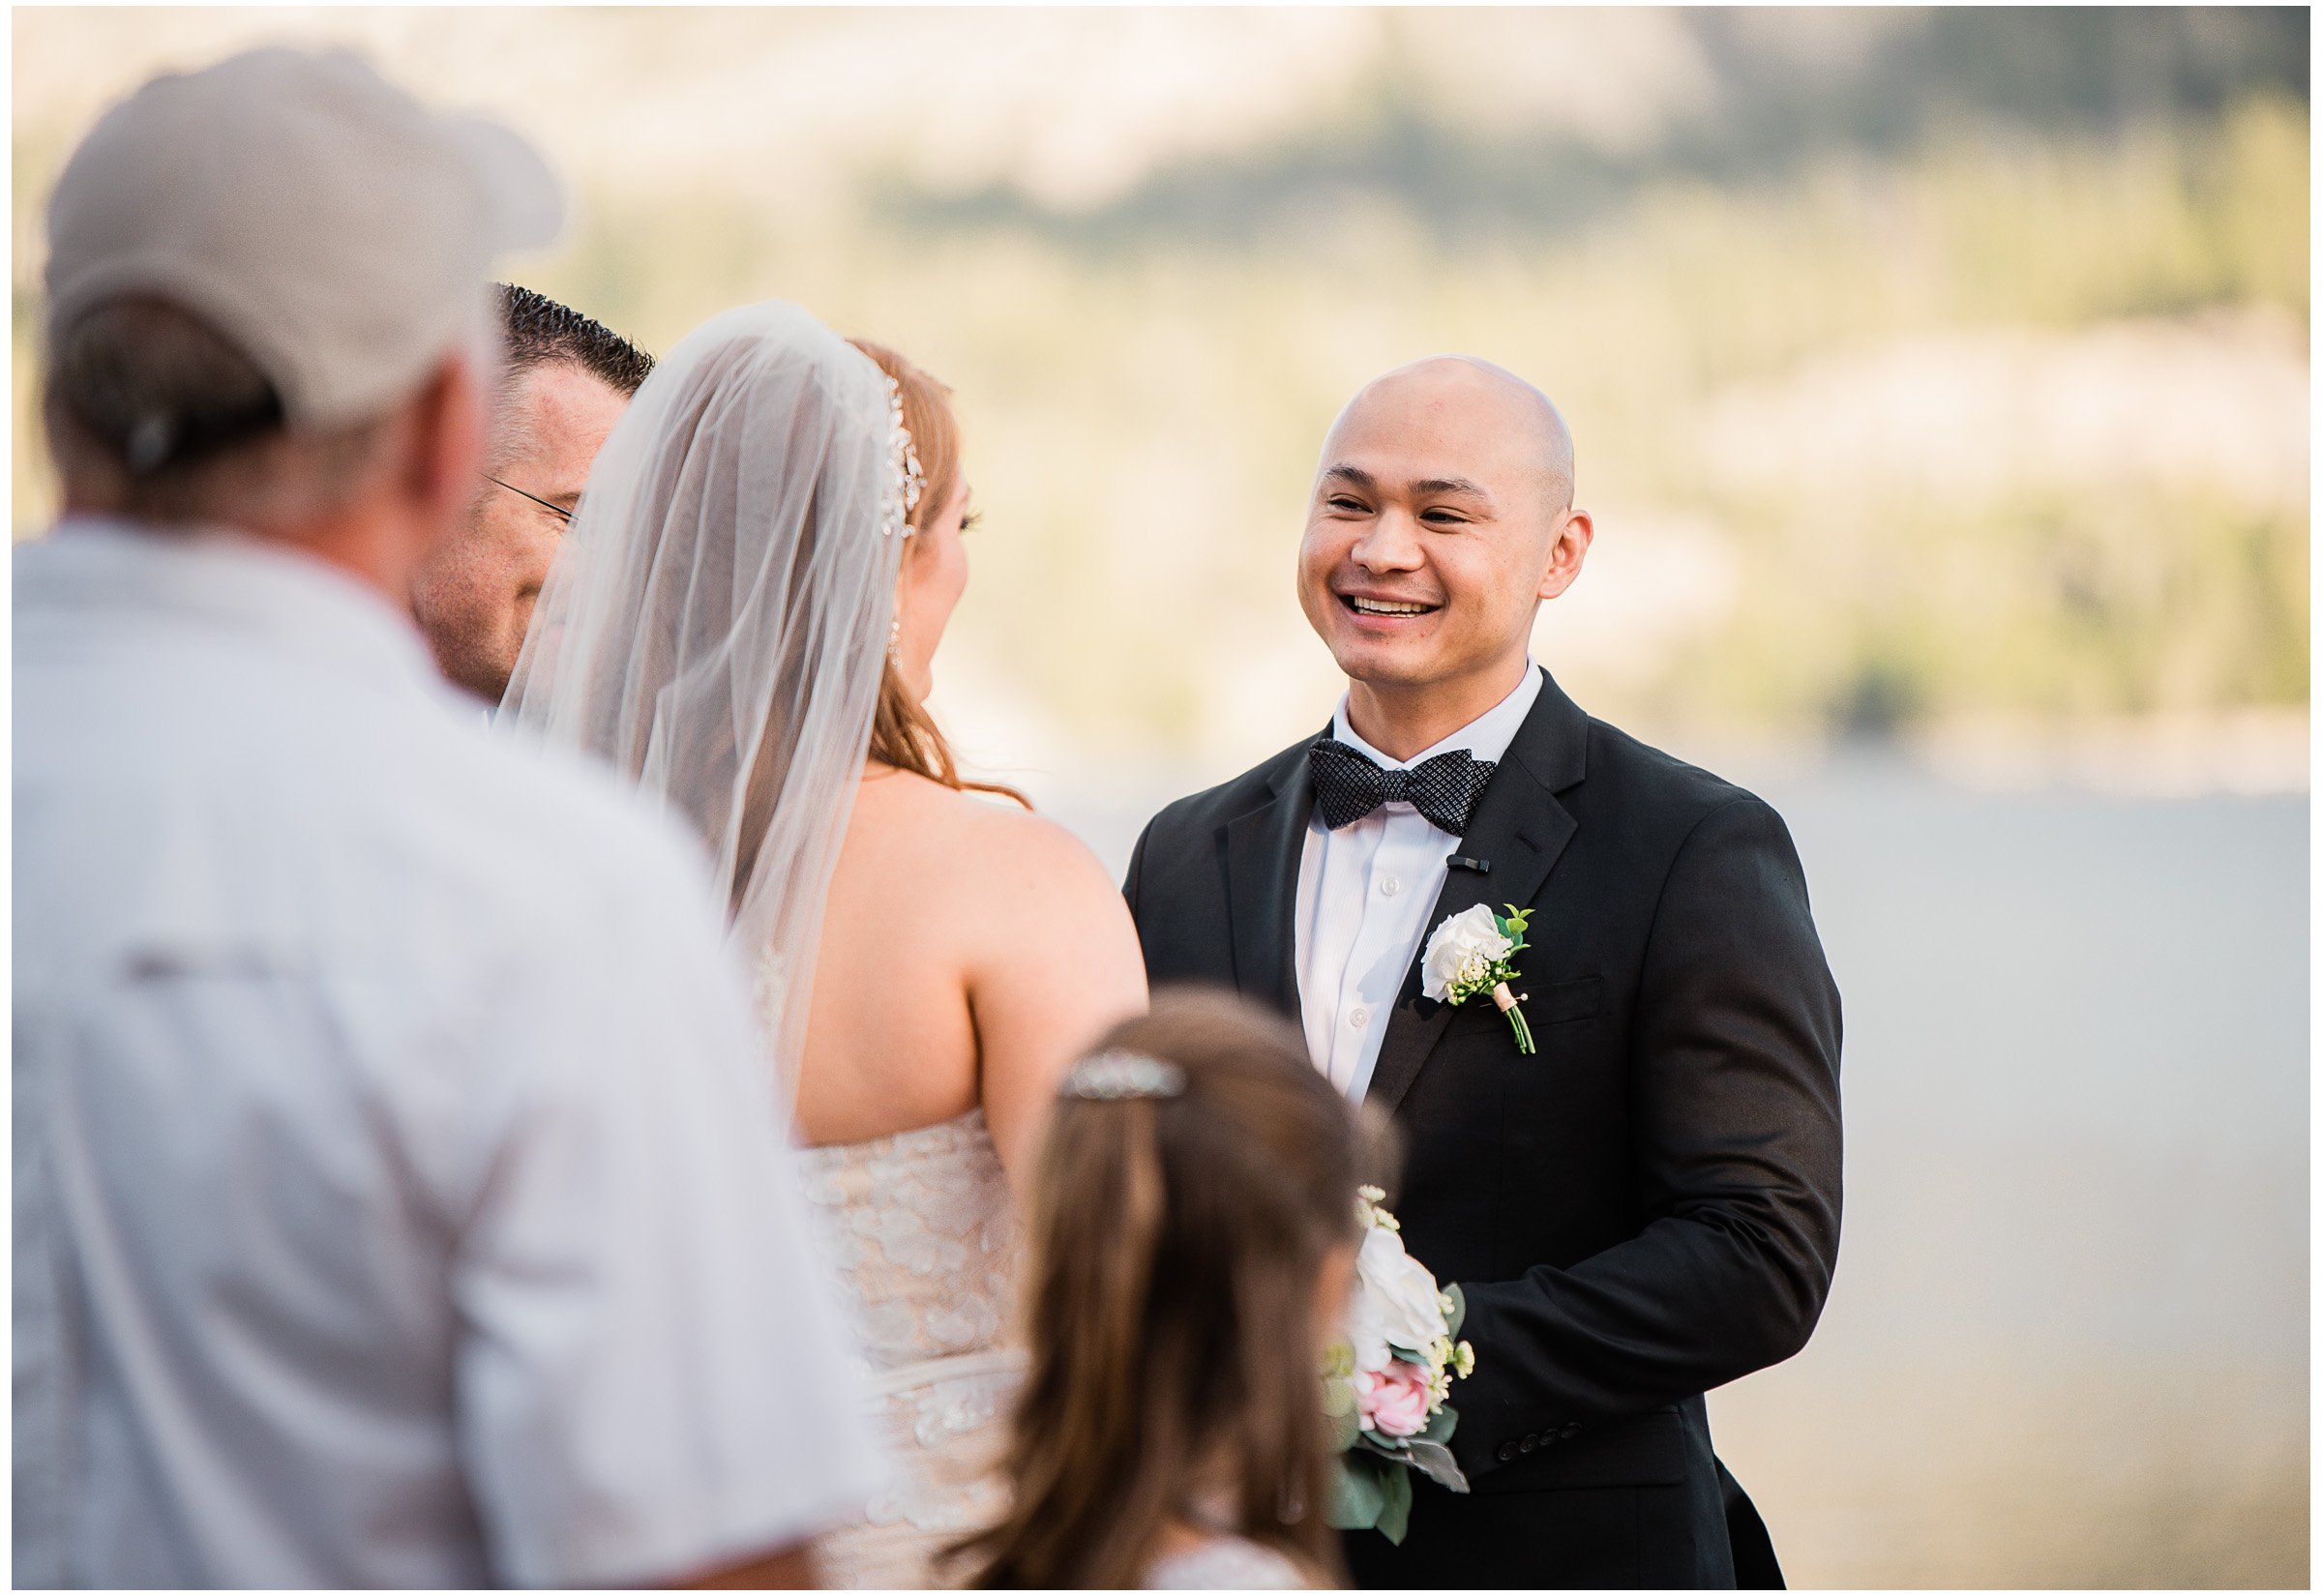 Clarksburg Wedding - Sacramento Photographer - Bogle Winery - Justin Wilcox Photography - 9.jpg